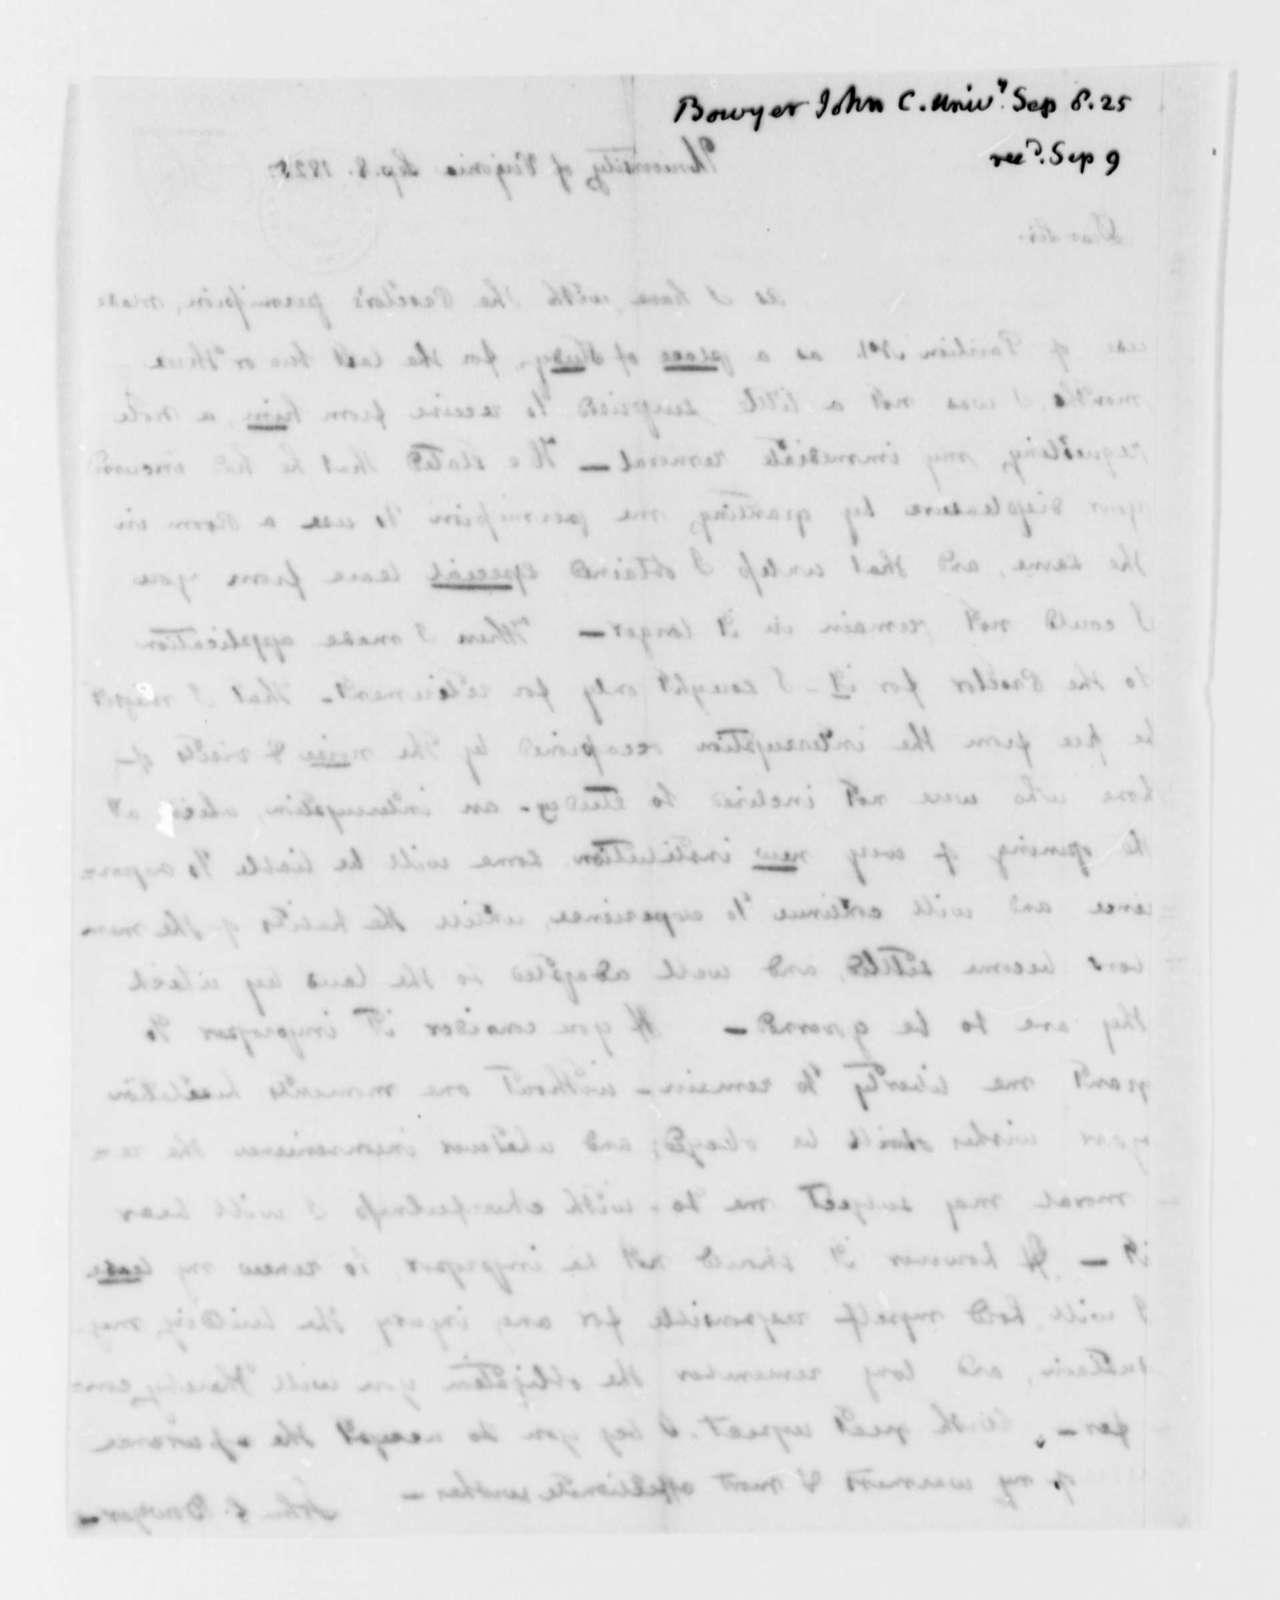 John C. Bowyer to Thomas Jefferson, September 8, 1825